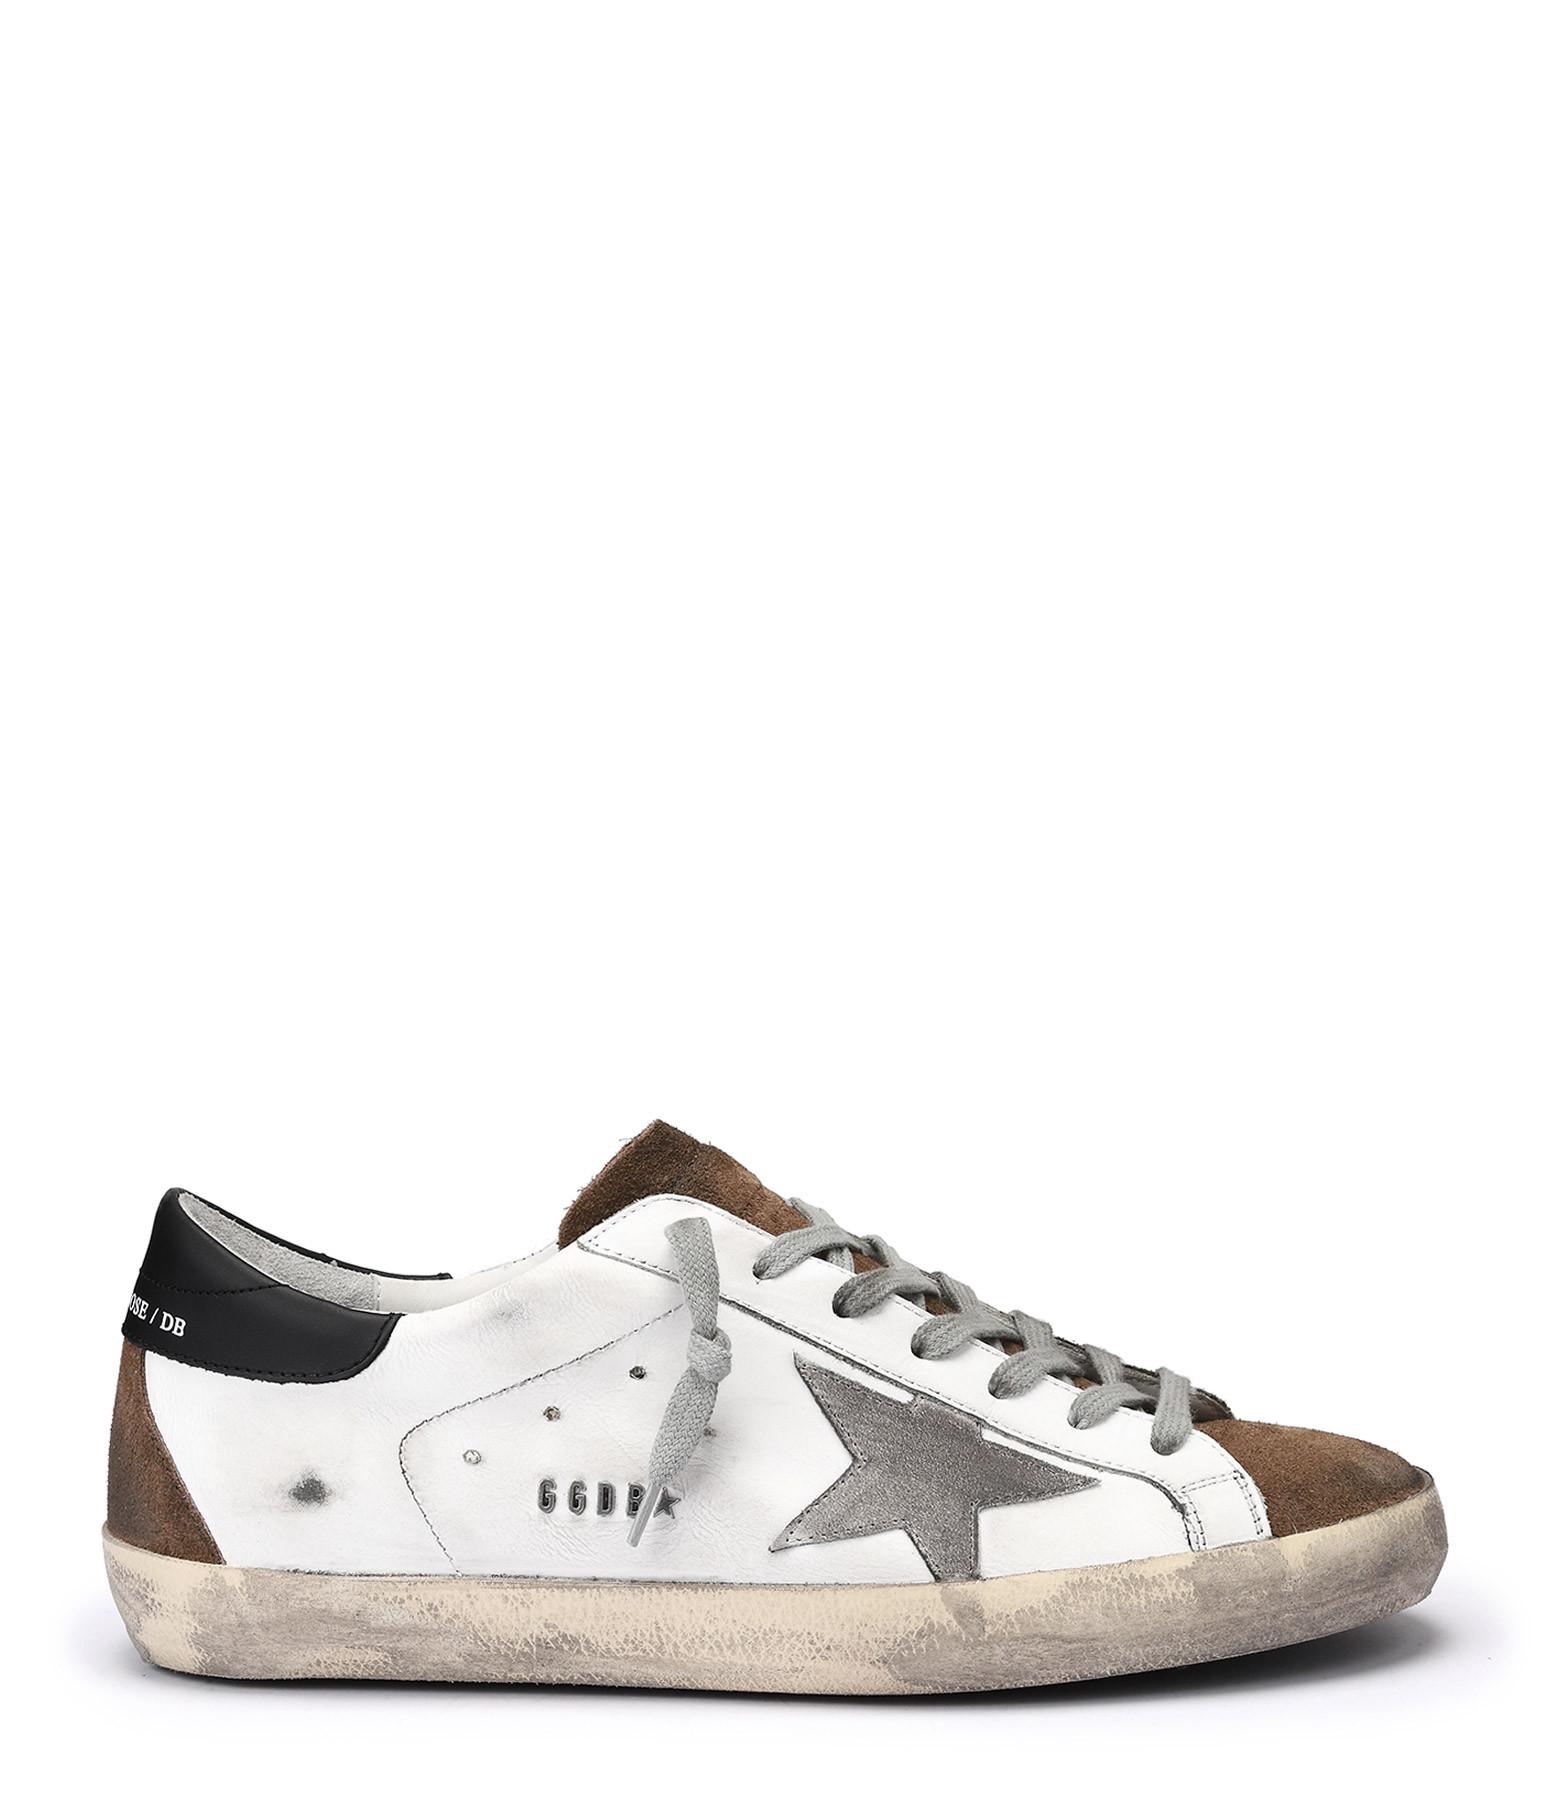 authorized site various design running shoes GOLDEN GOOSE - Baskets Homme Superstar Cuir Suédé Blanc Bleu